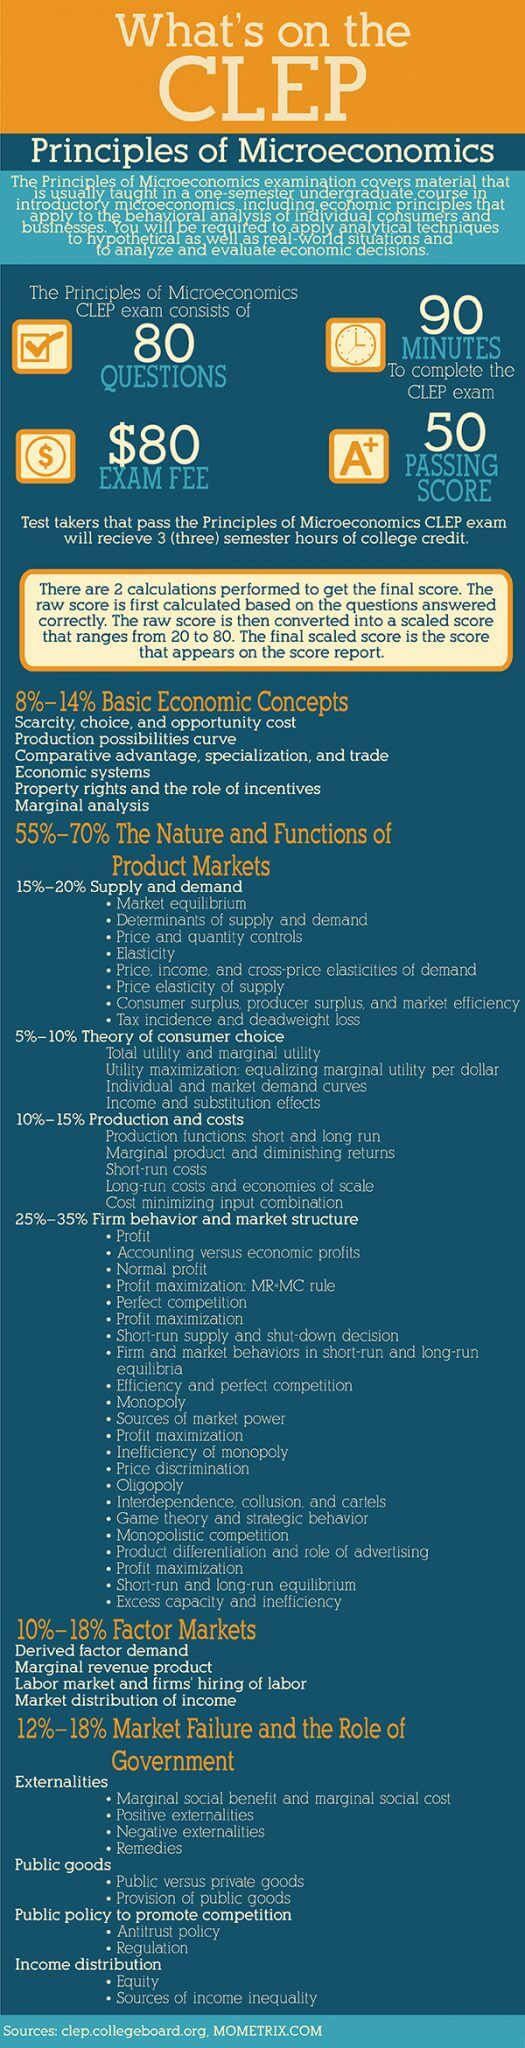 Infographic explaining principles of microeconomics CLEP test